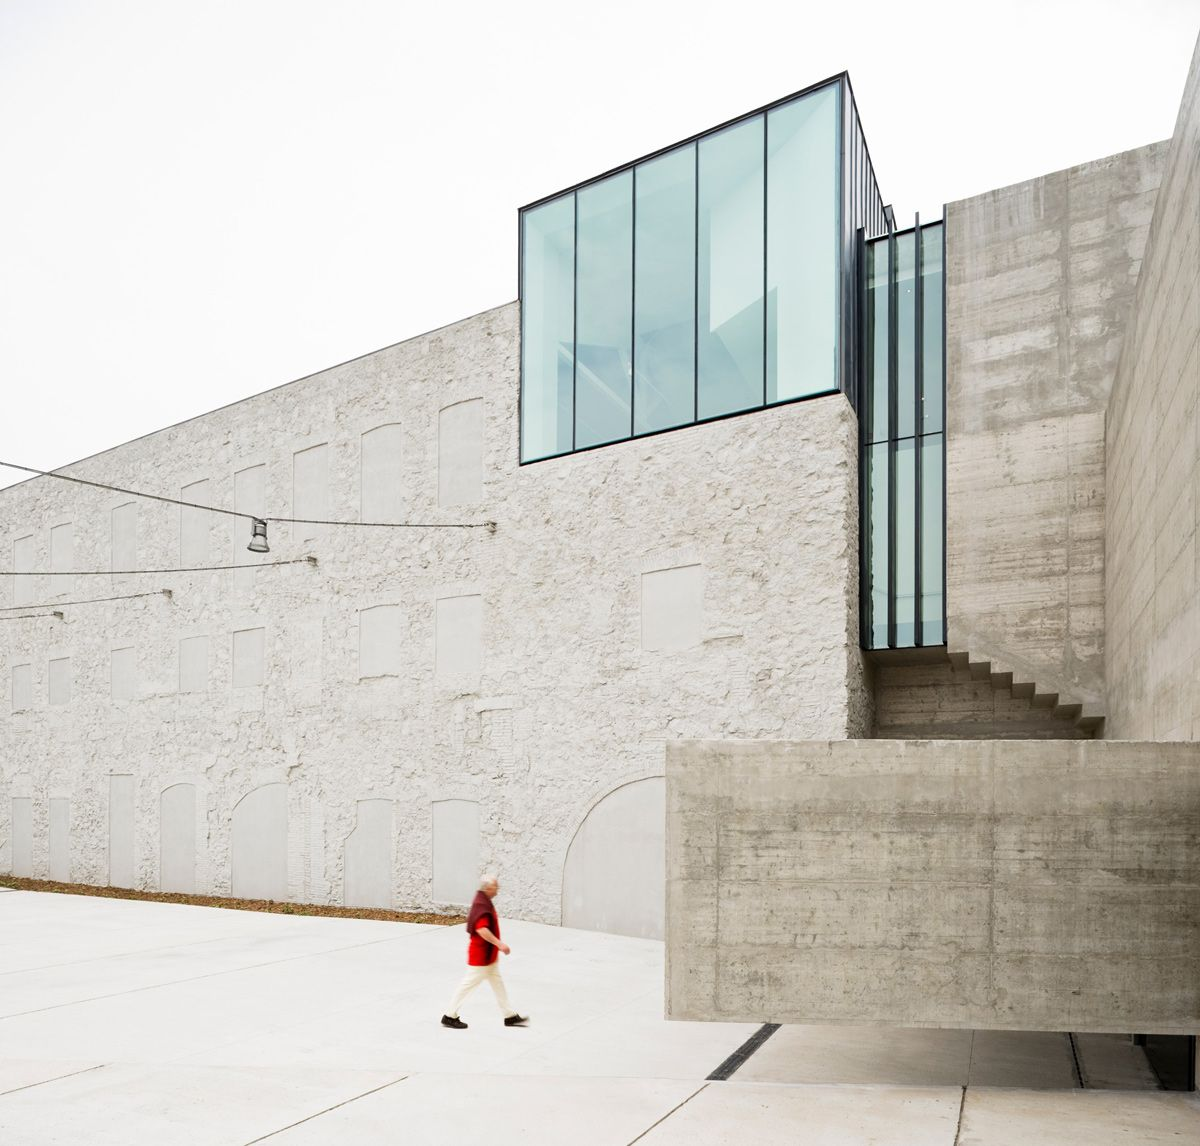 Baas arquitectura estudio de arquitectura barcelona architecture 01 pinterest - Estudio arquitectura barcelona ...